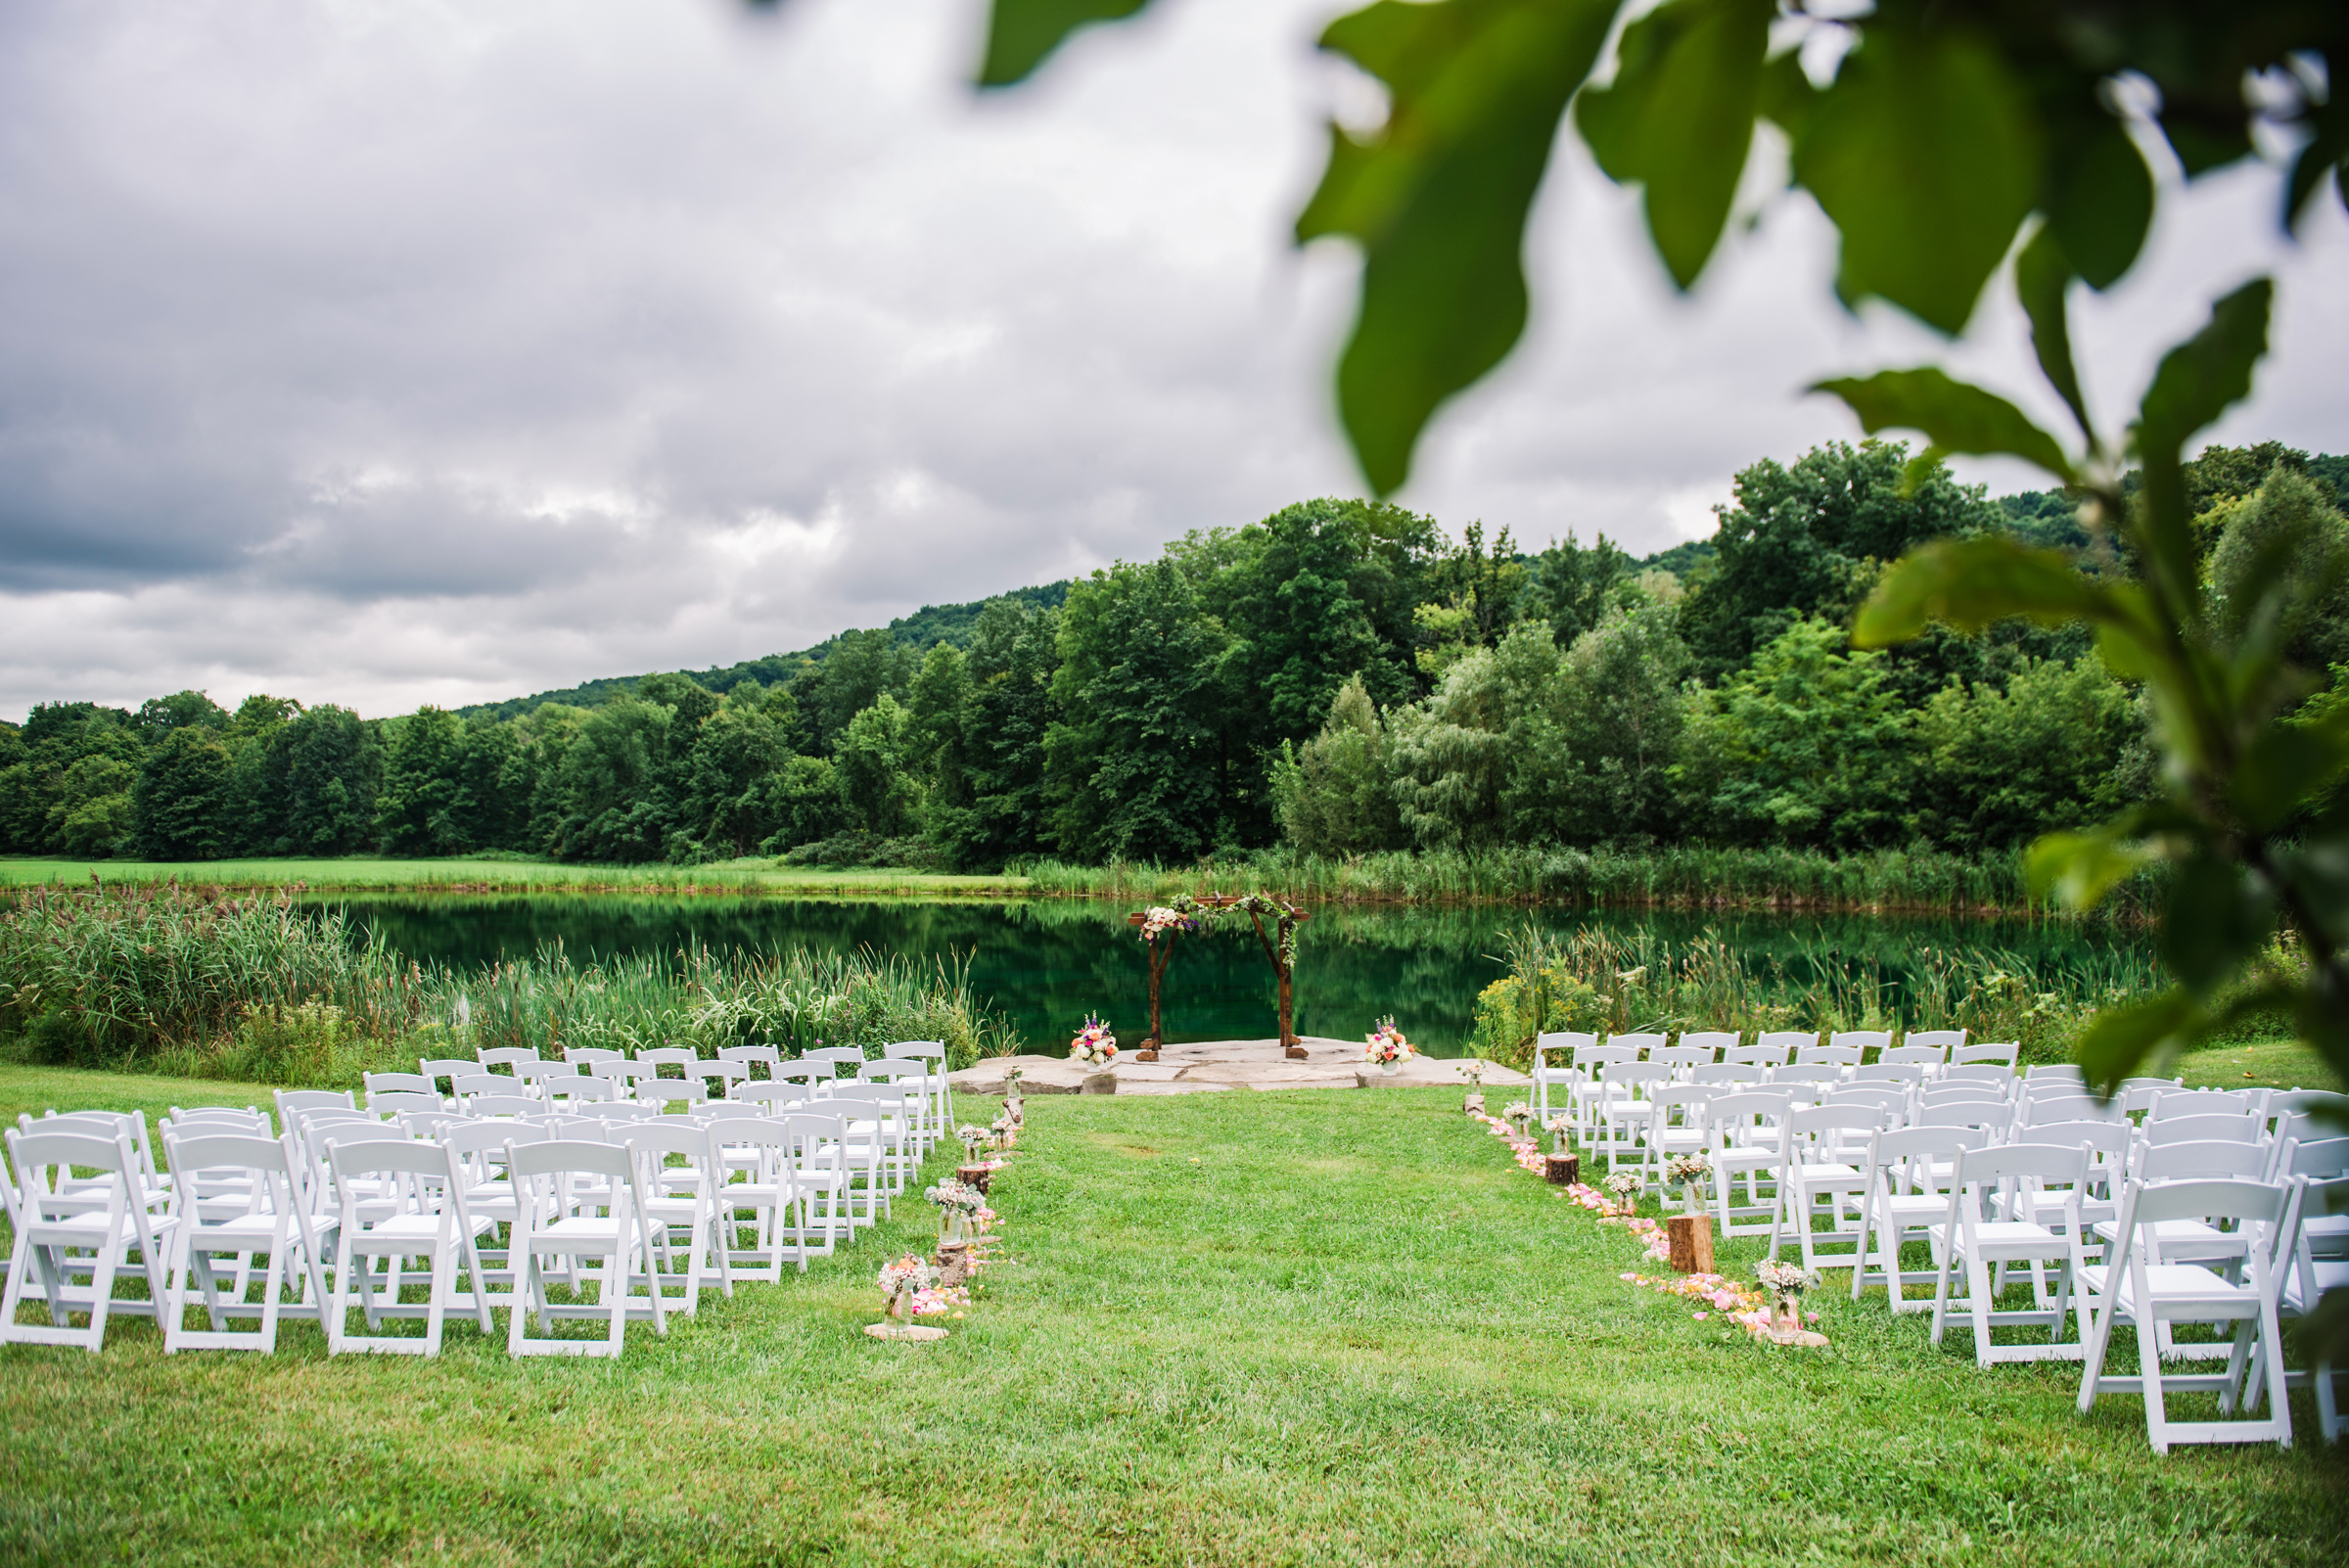 Wolf_Oak_Acres_Central_NY_Wedding_JILL_STUDIO_Rochester_NY_Photographer_DSC_8286.jpg